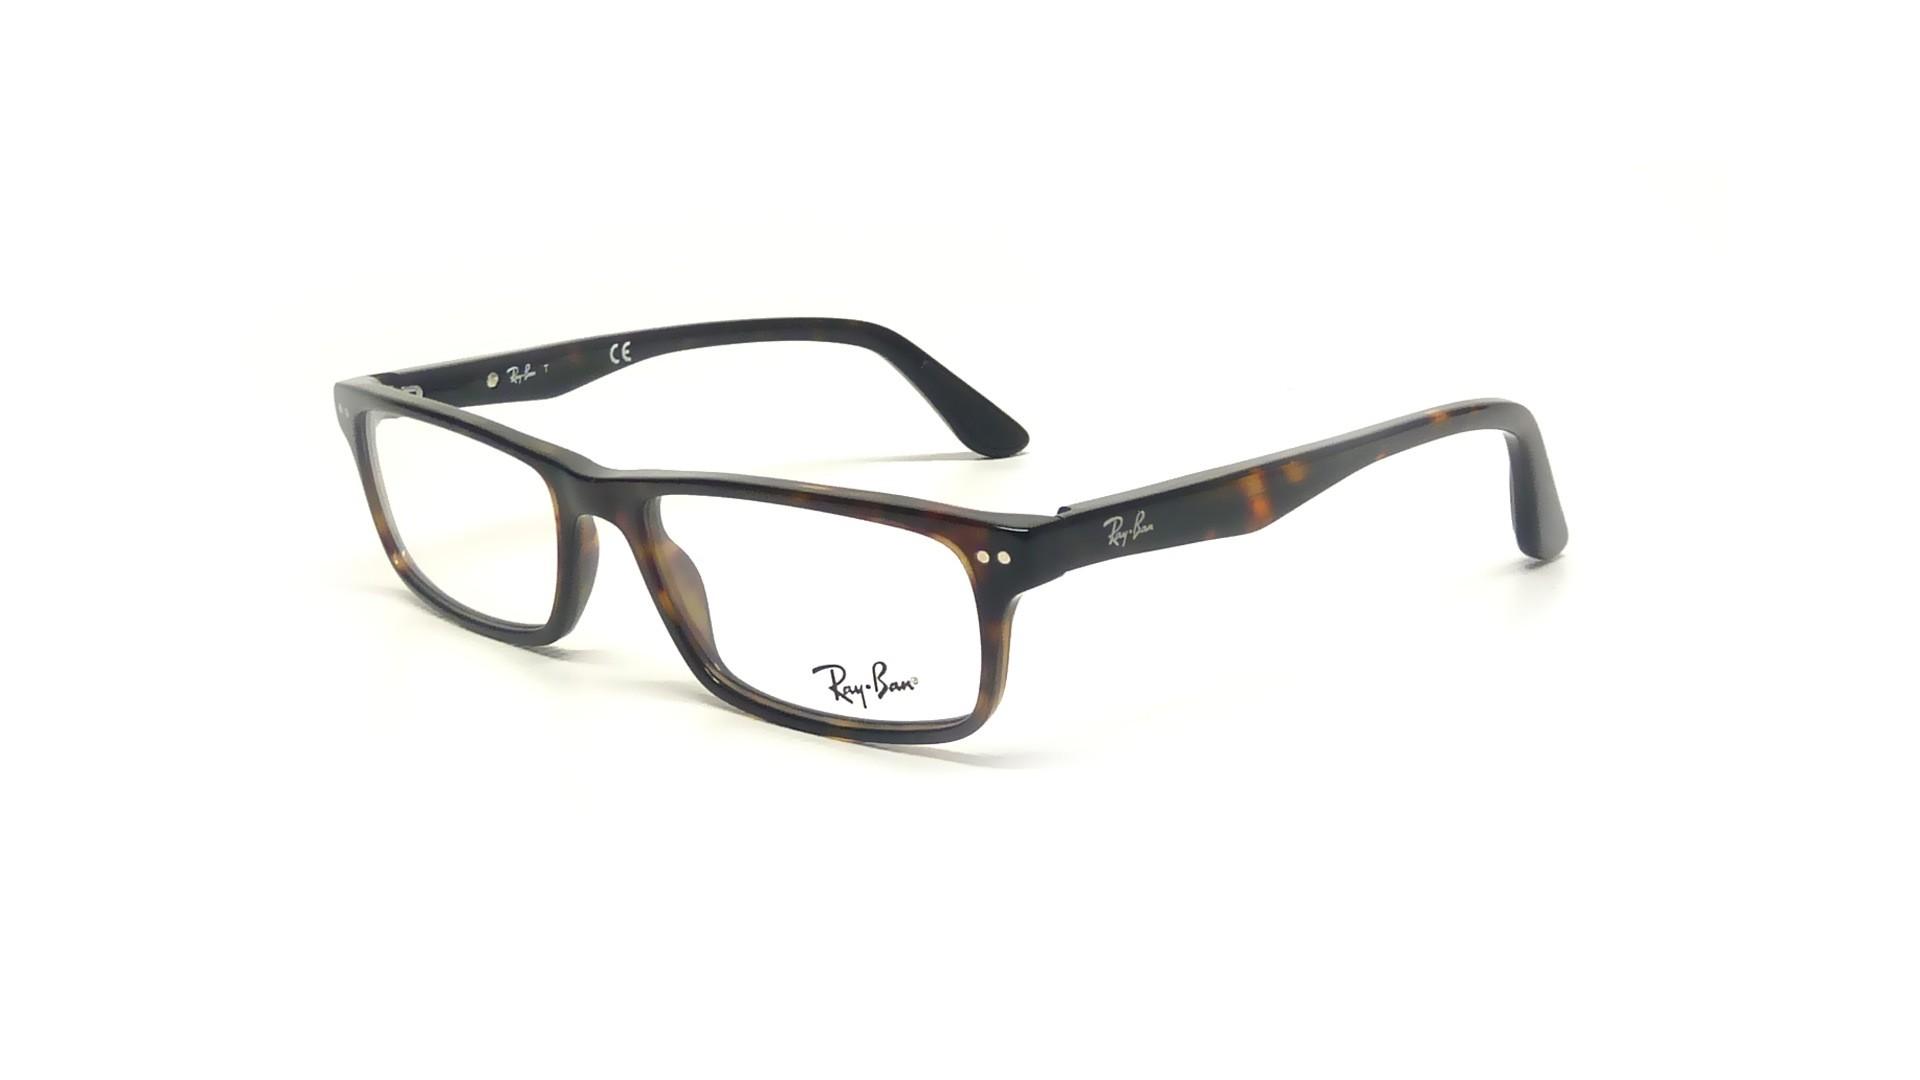 a65abdbf0c Eyeglasses Ray-Ban RX5277 RB5277 2012 54-17 Tortoise Large